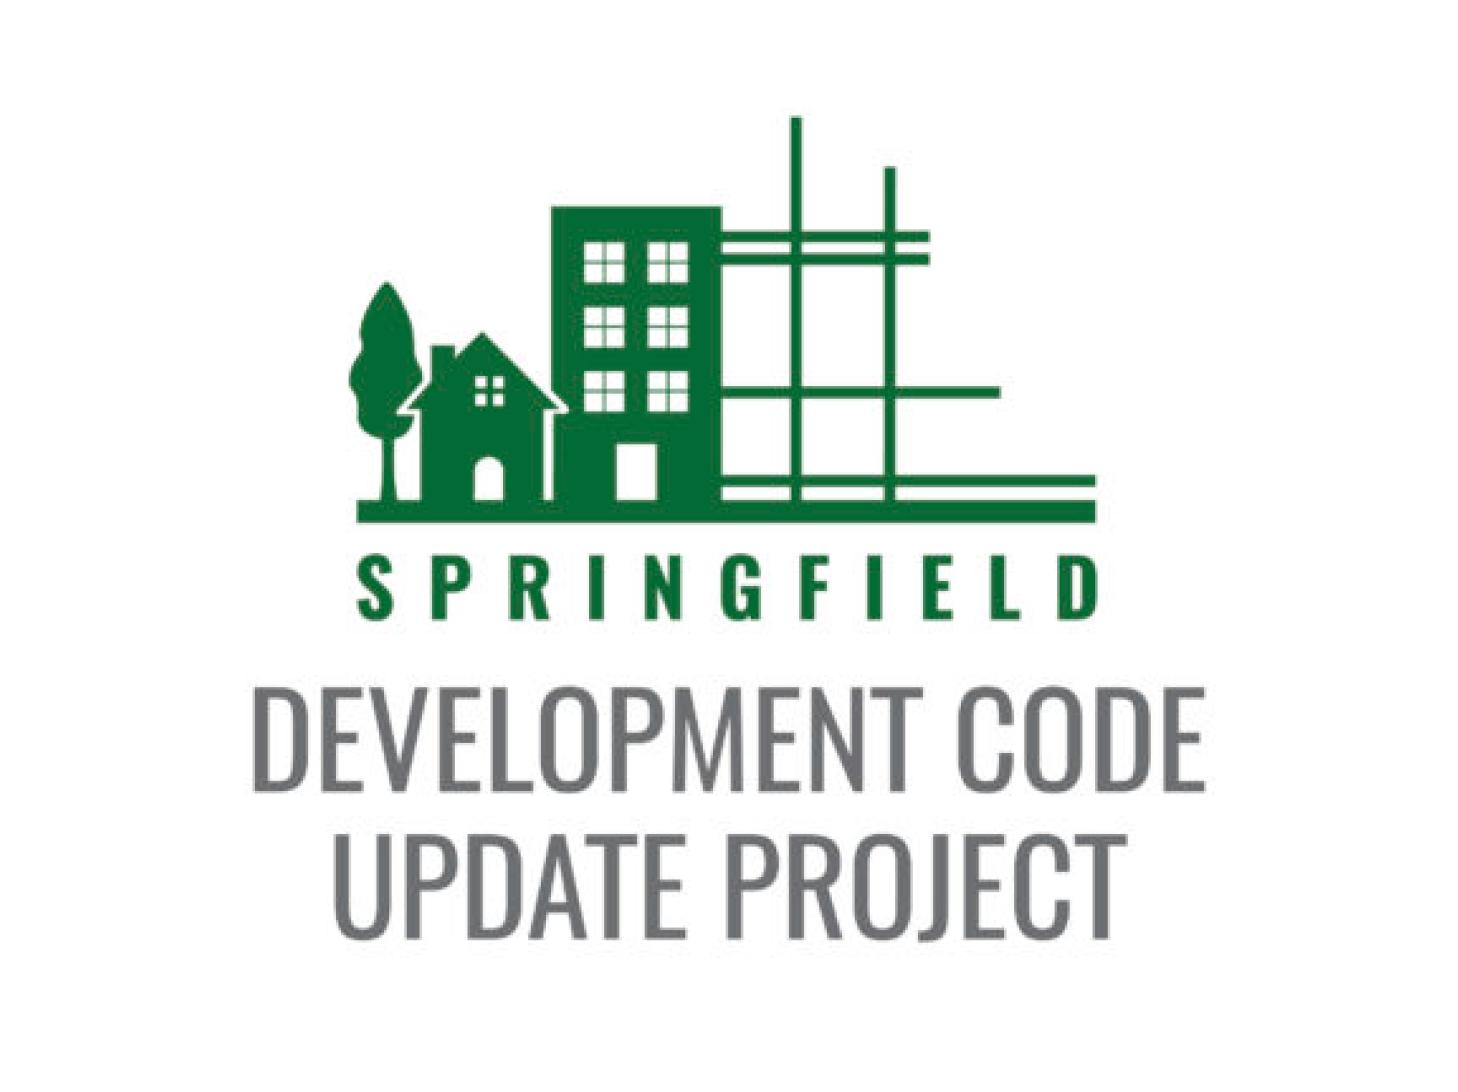 Development Code Update Project Logo